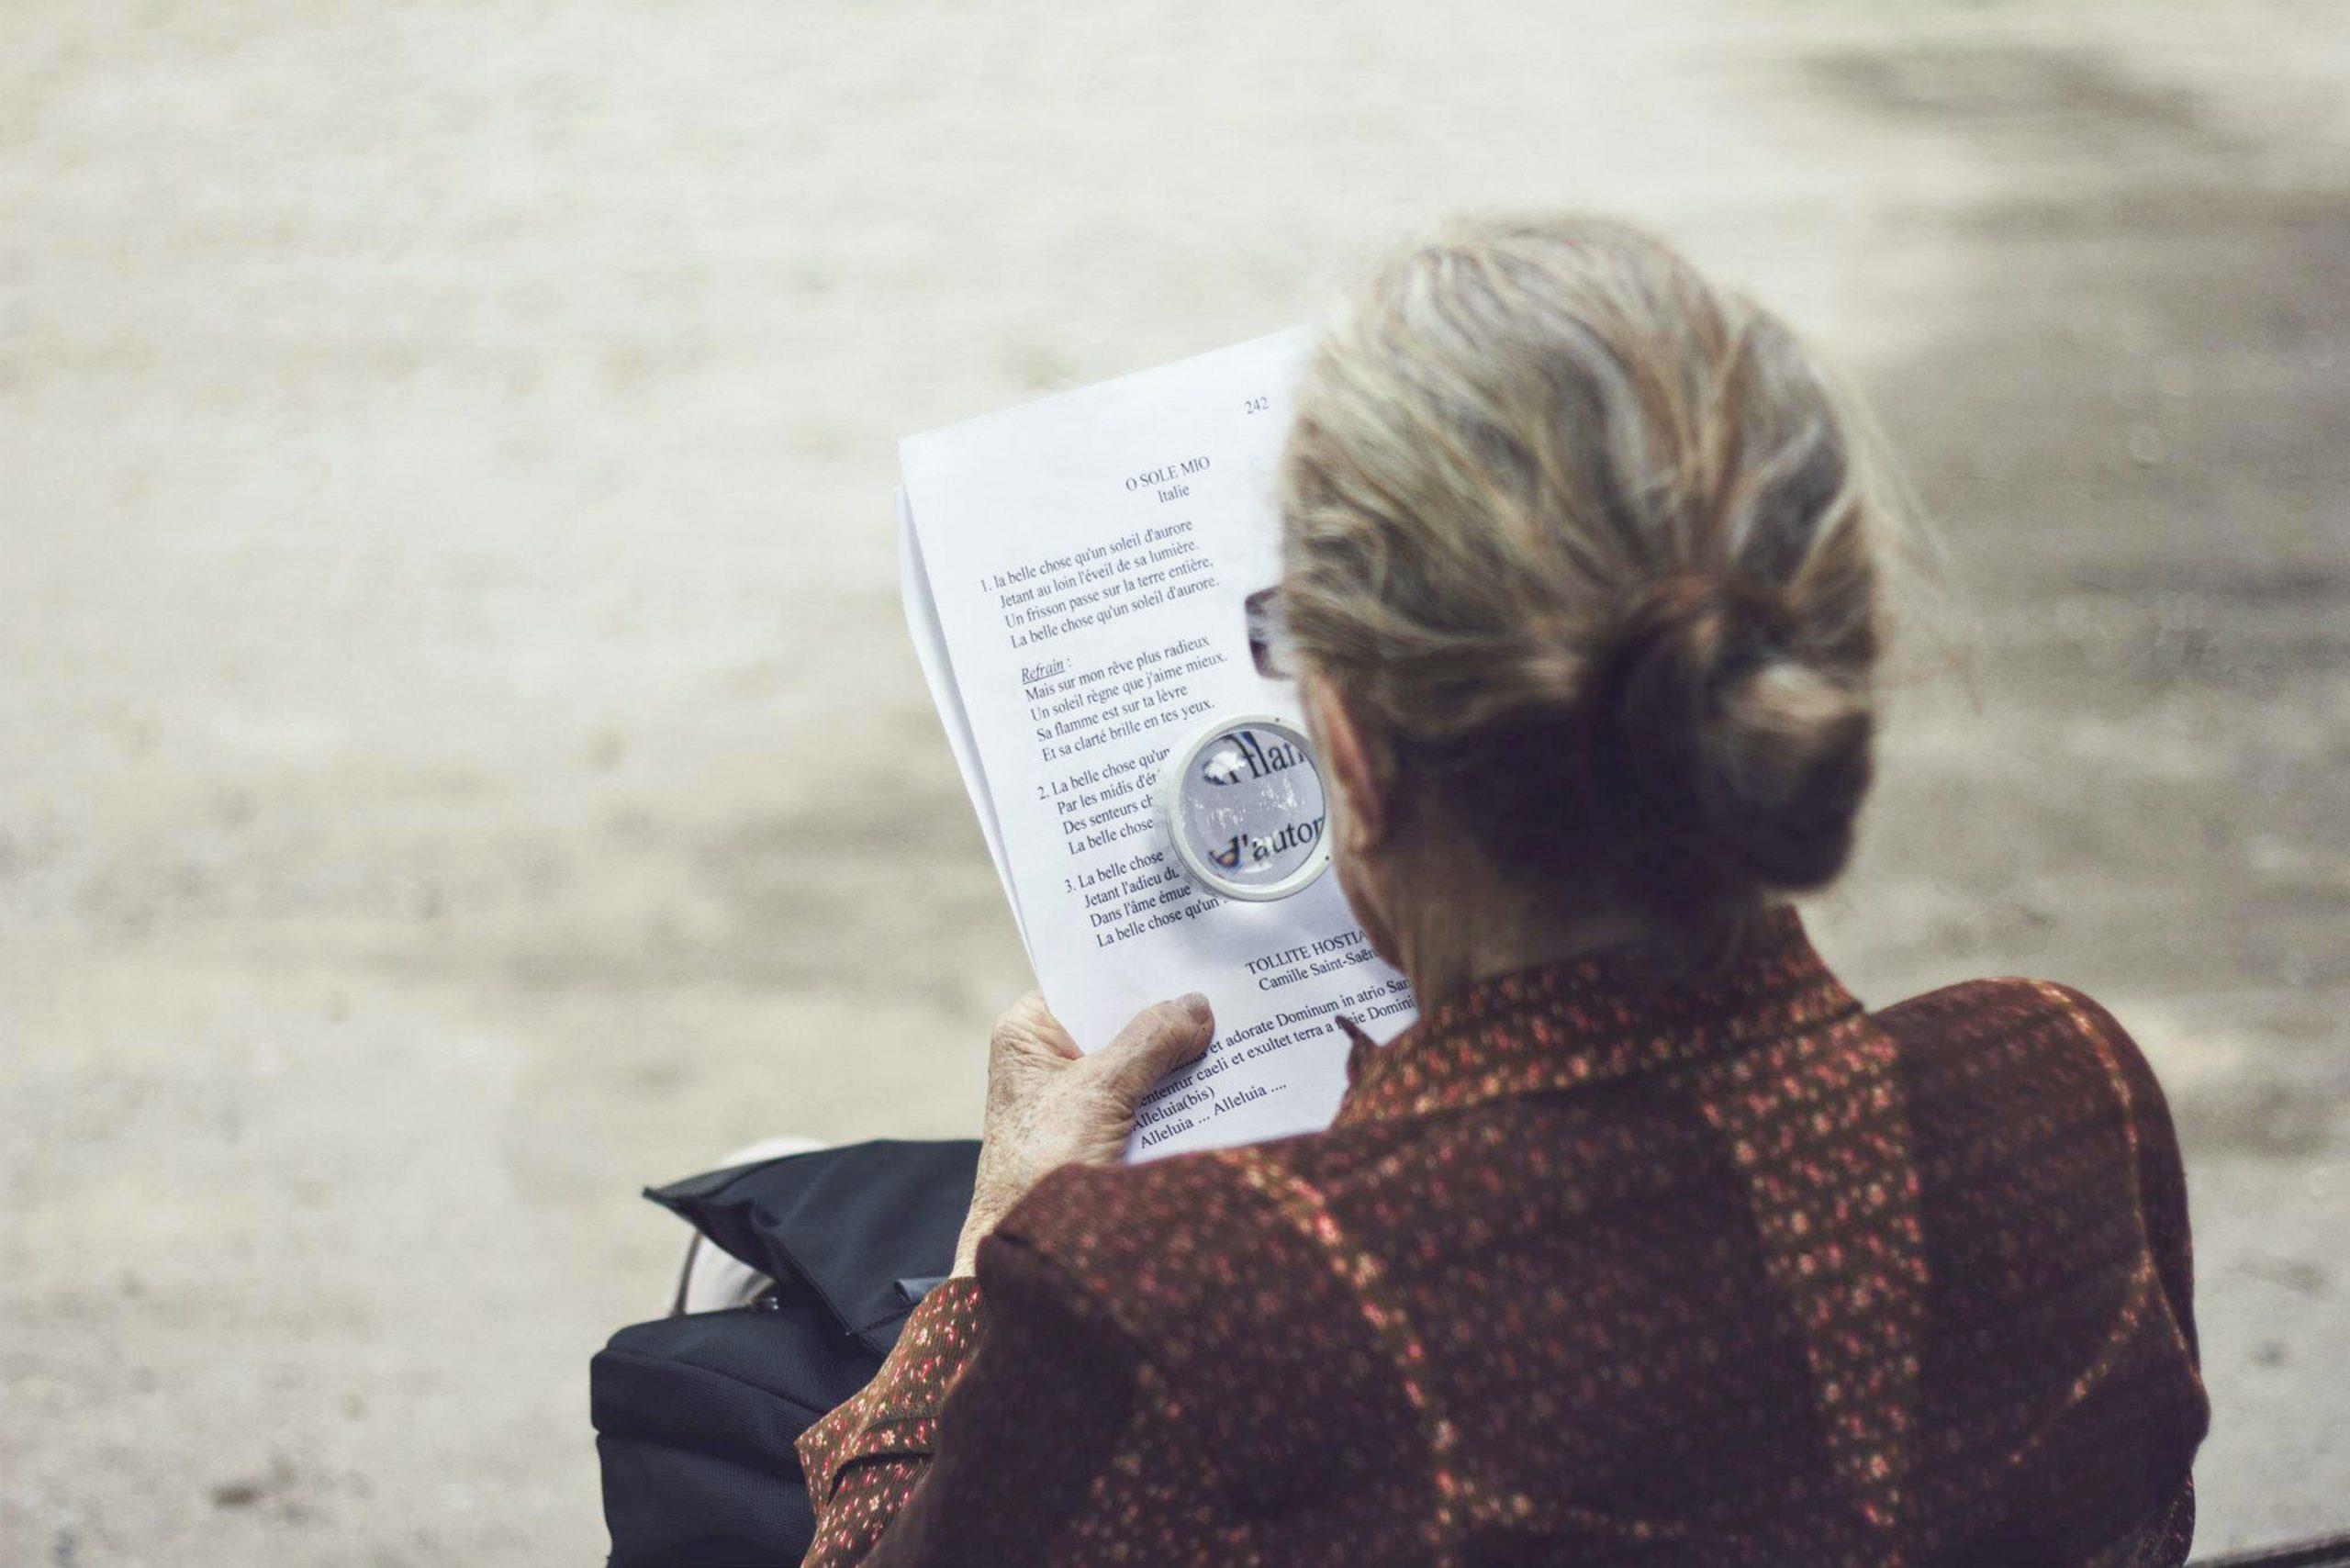 Maladie d'Alzheimer: prévention et accompagnement en naturopathie